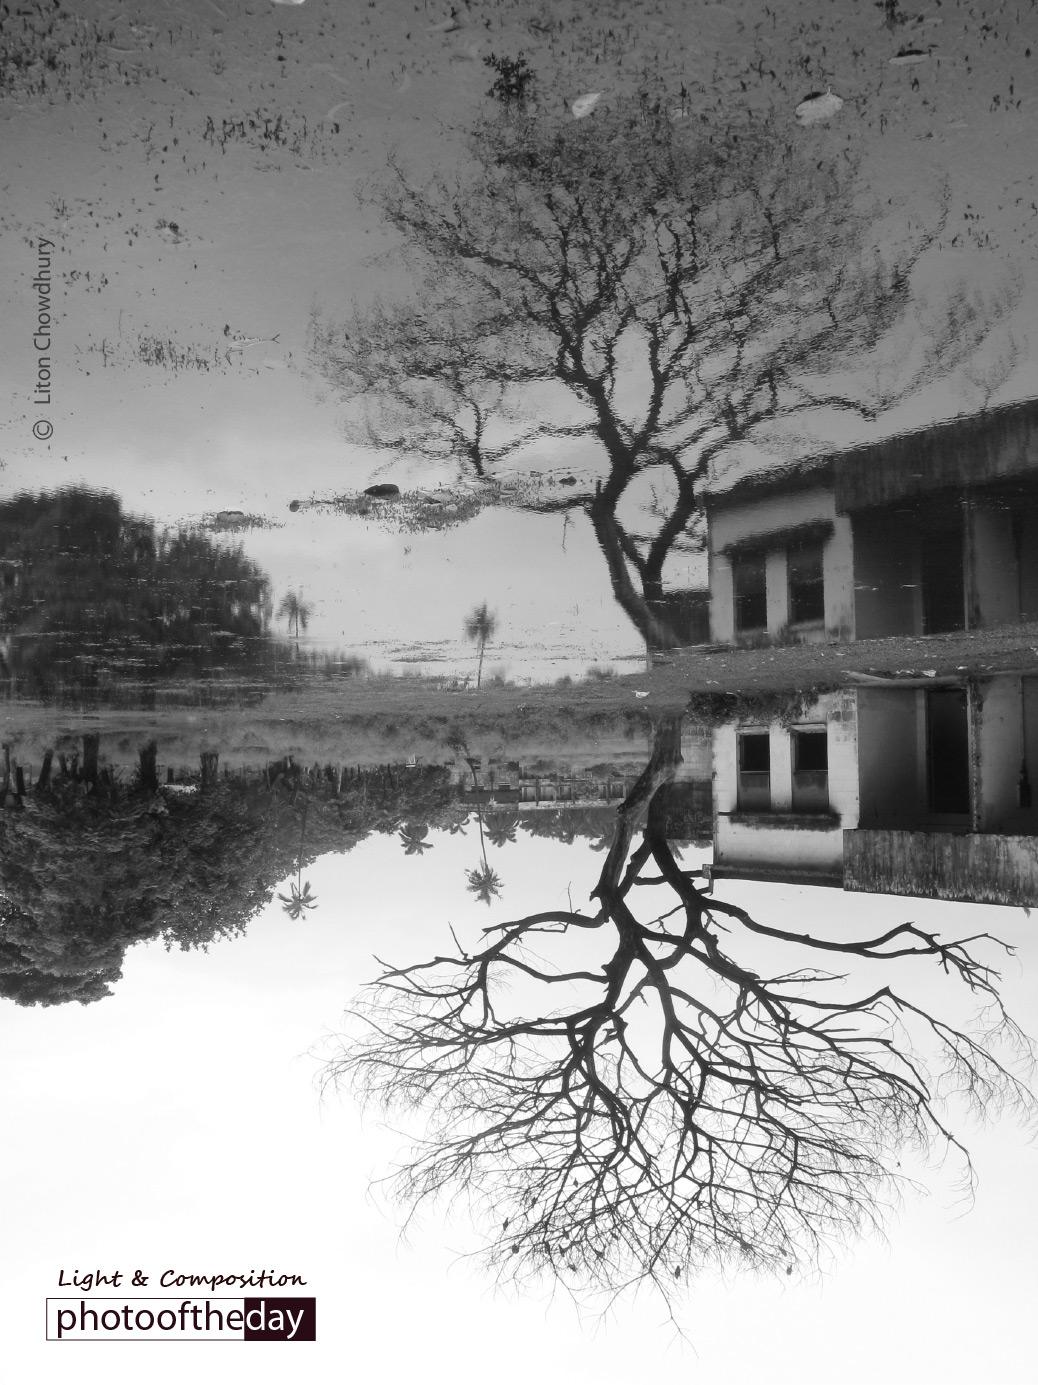 A Dead Reflection, by Liton Chowdhury